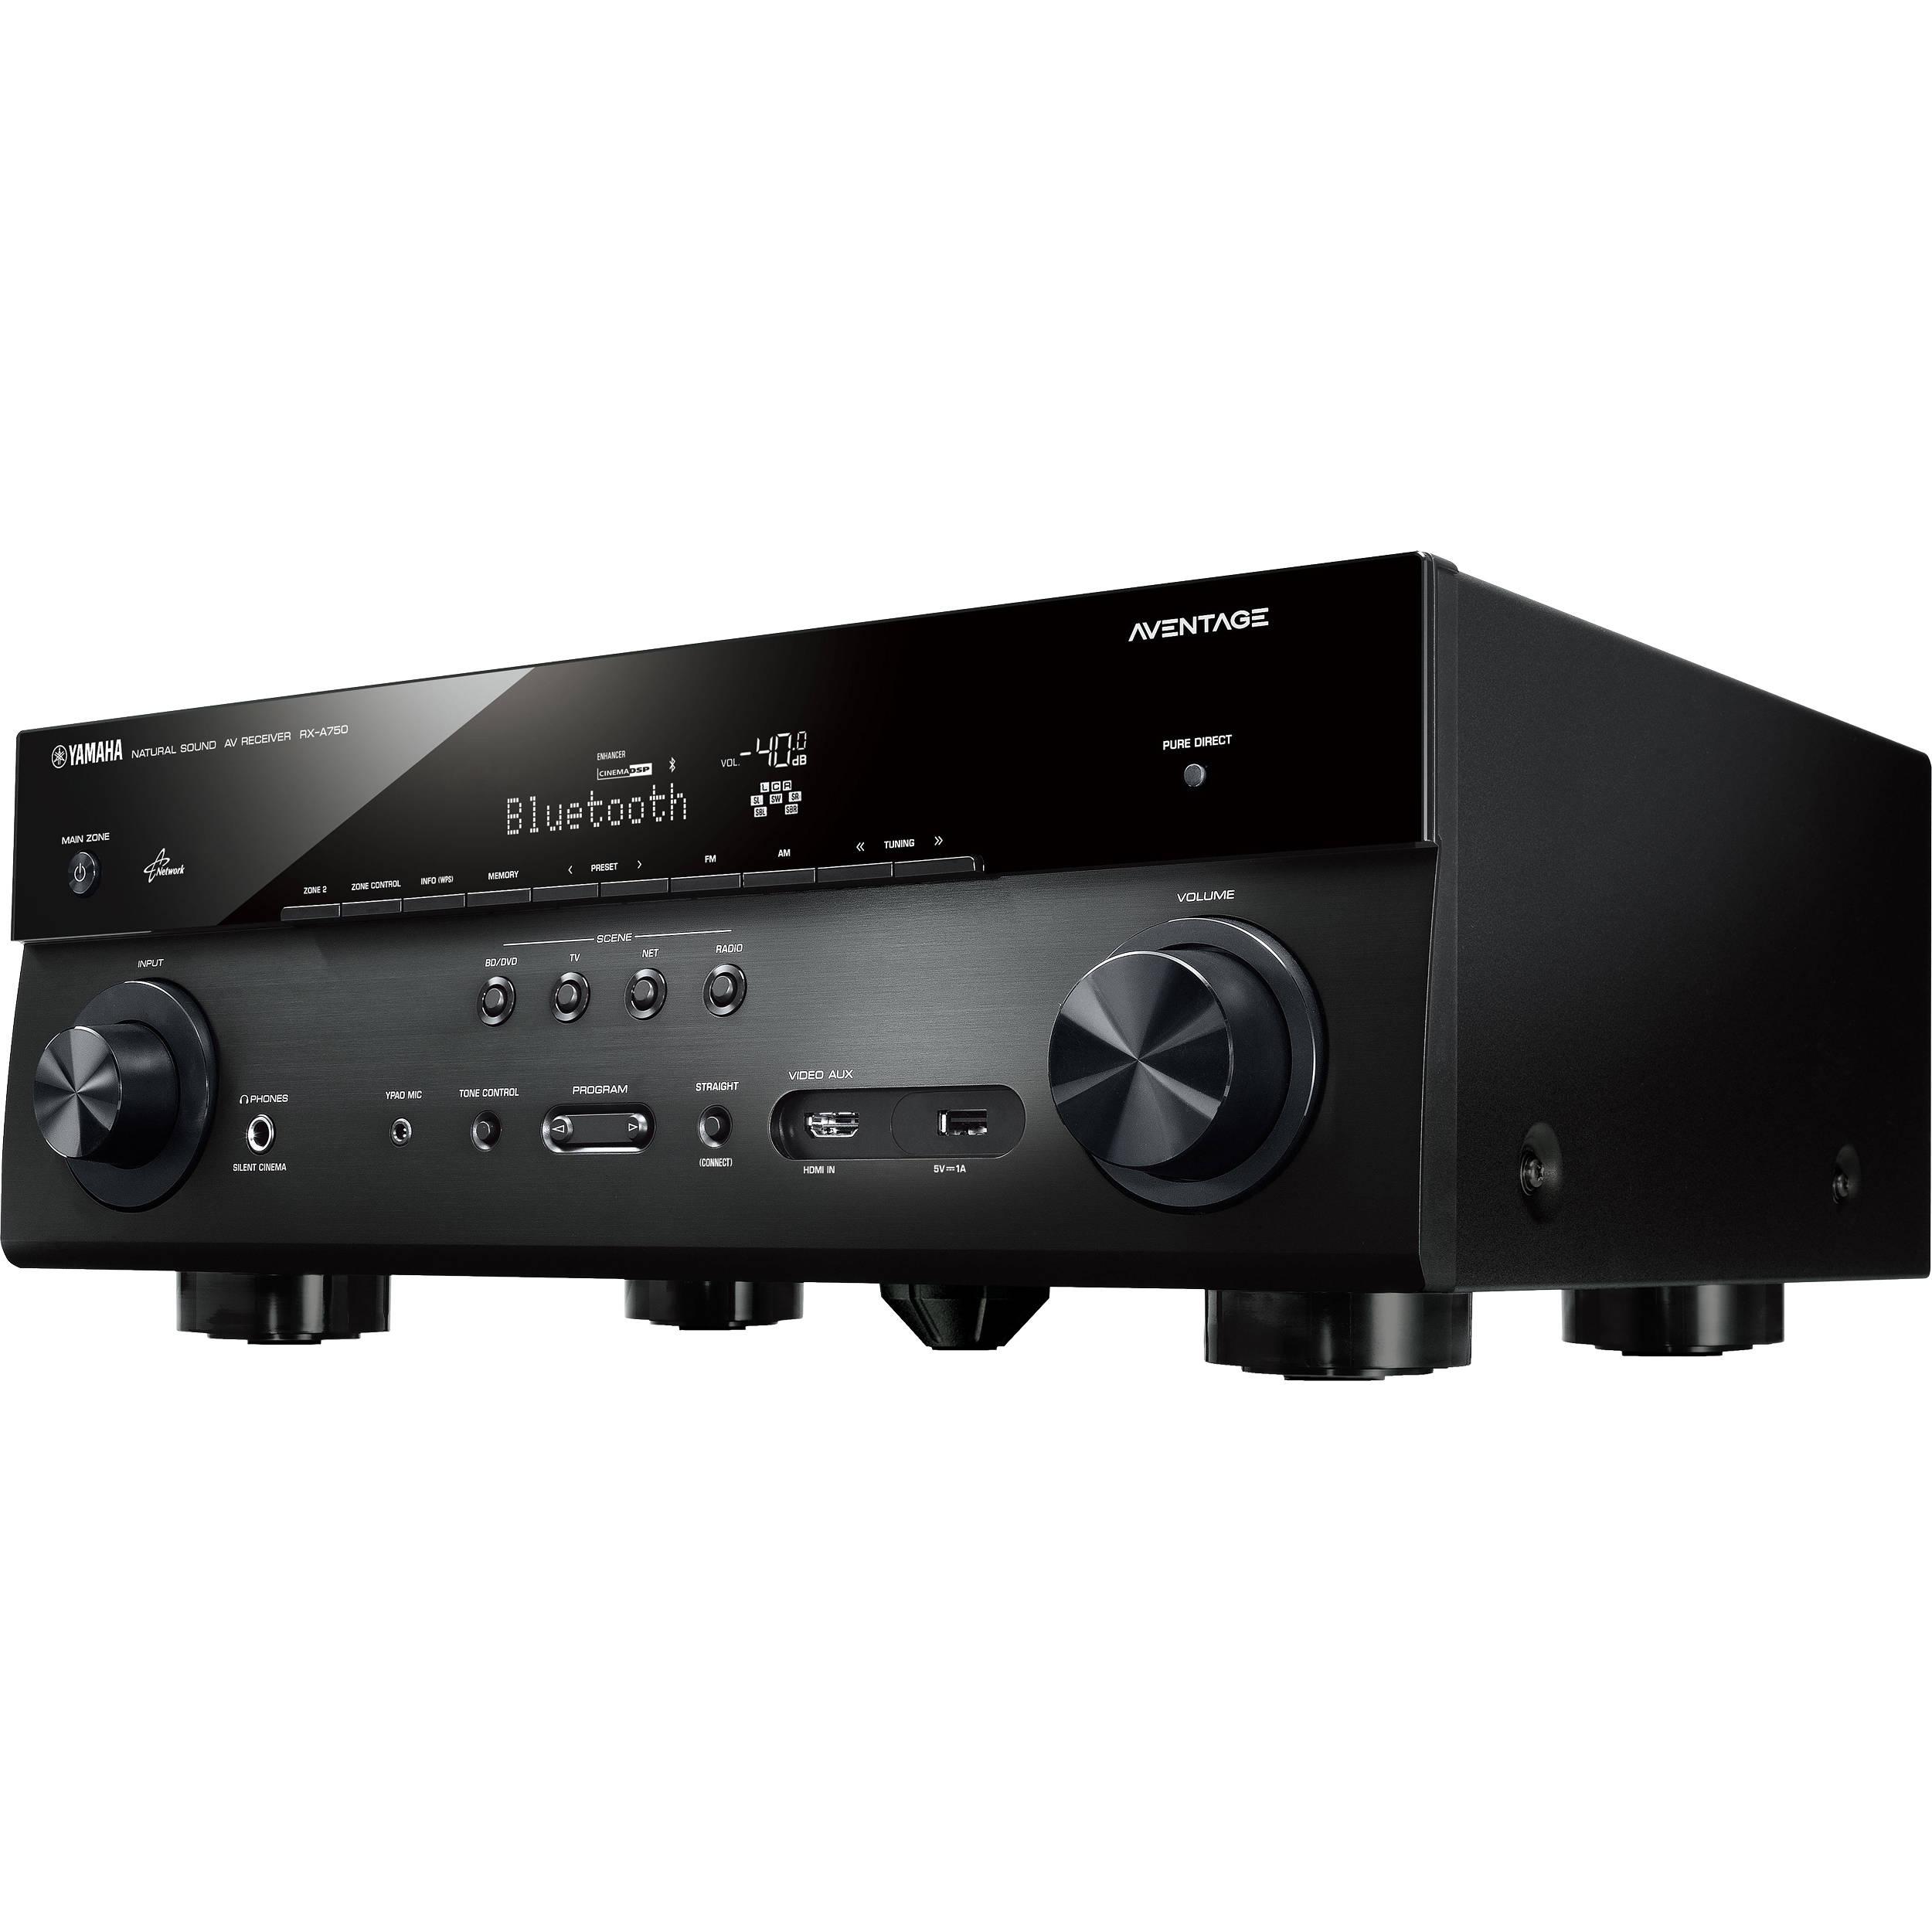 Yamaha AVENTAGE RX-A750BL 7.2-Channel Network AV RX-A750BL B&H